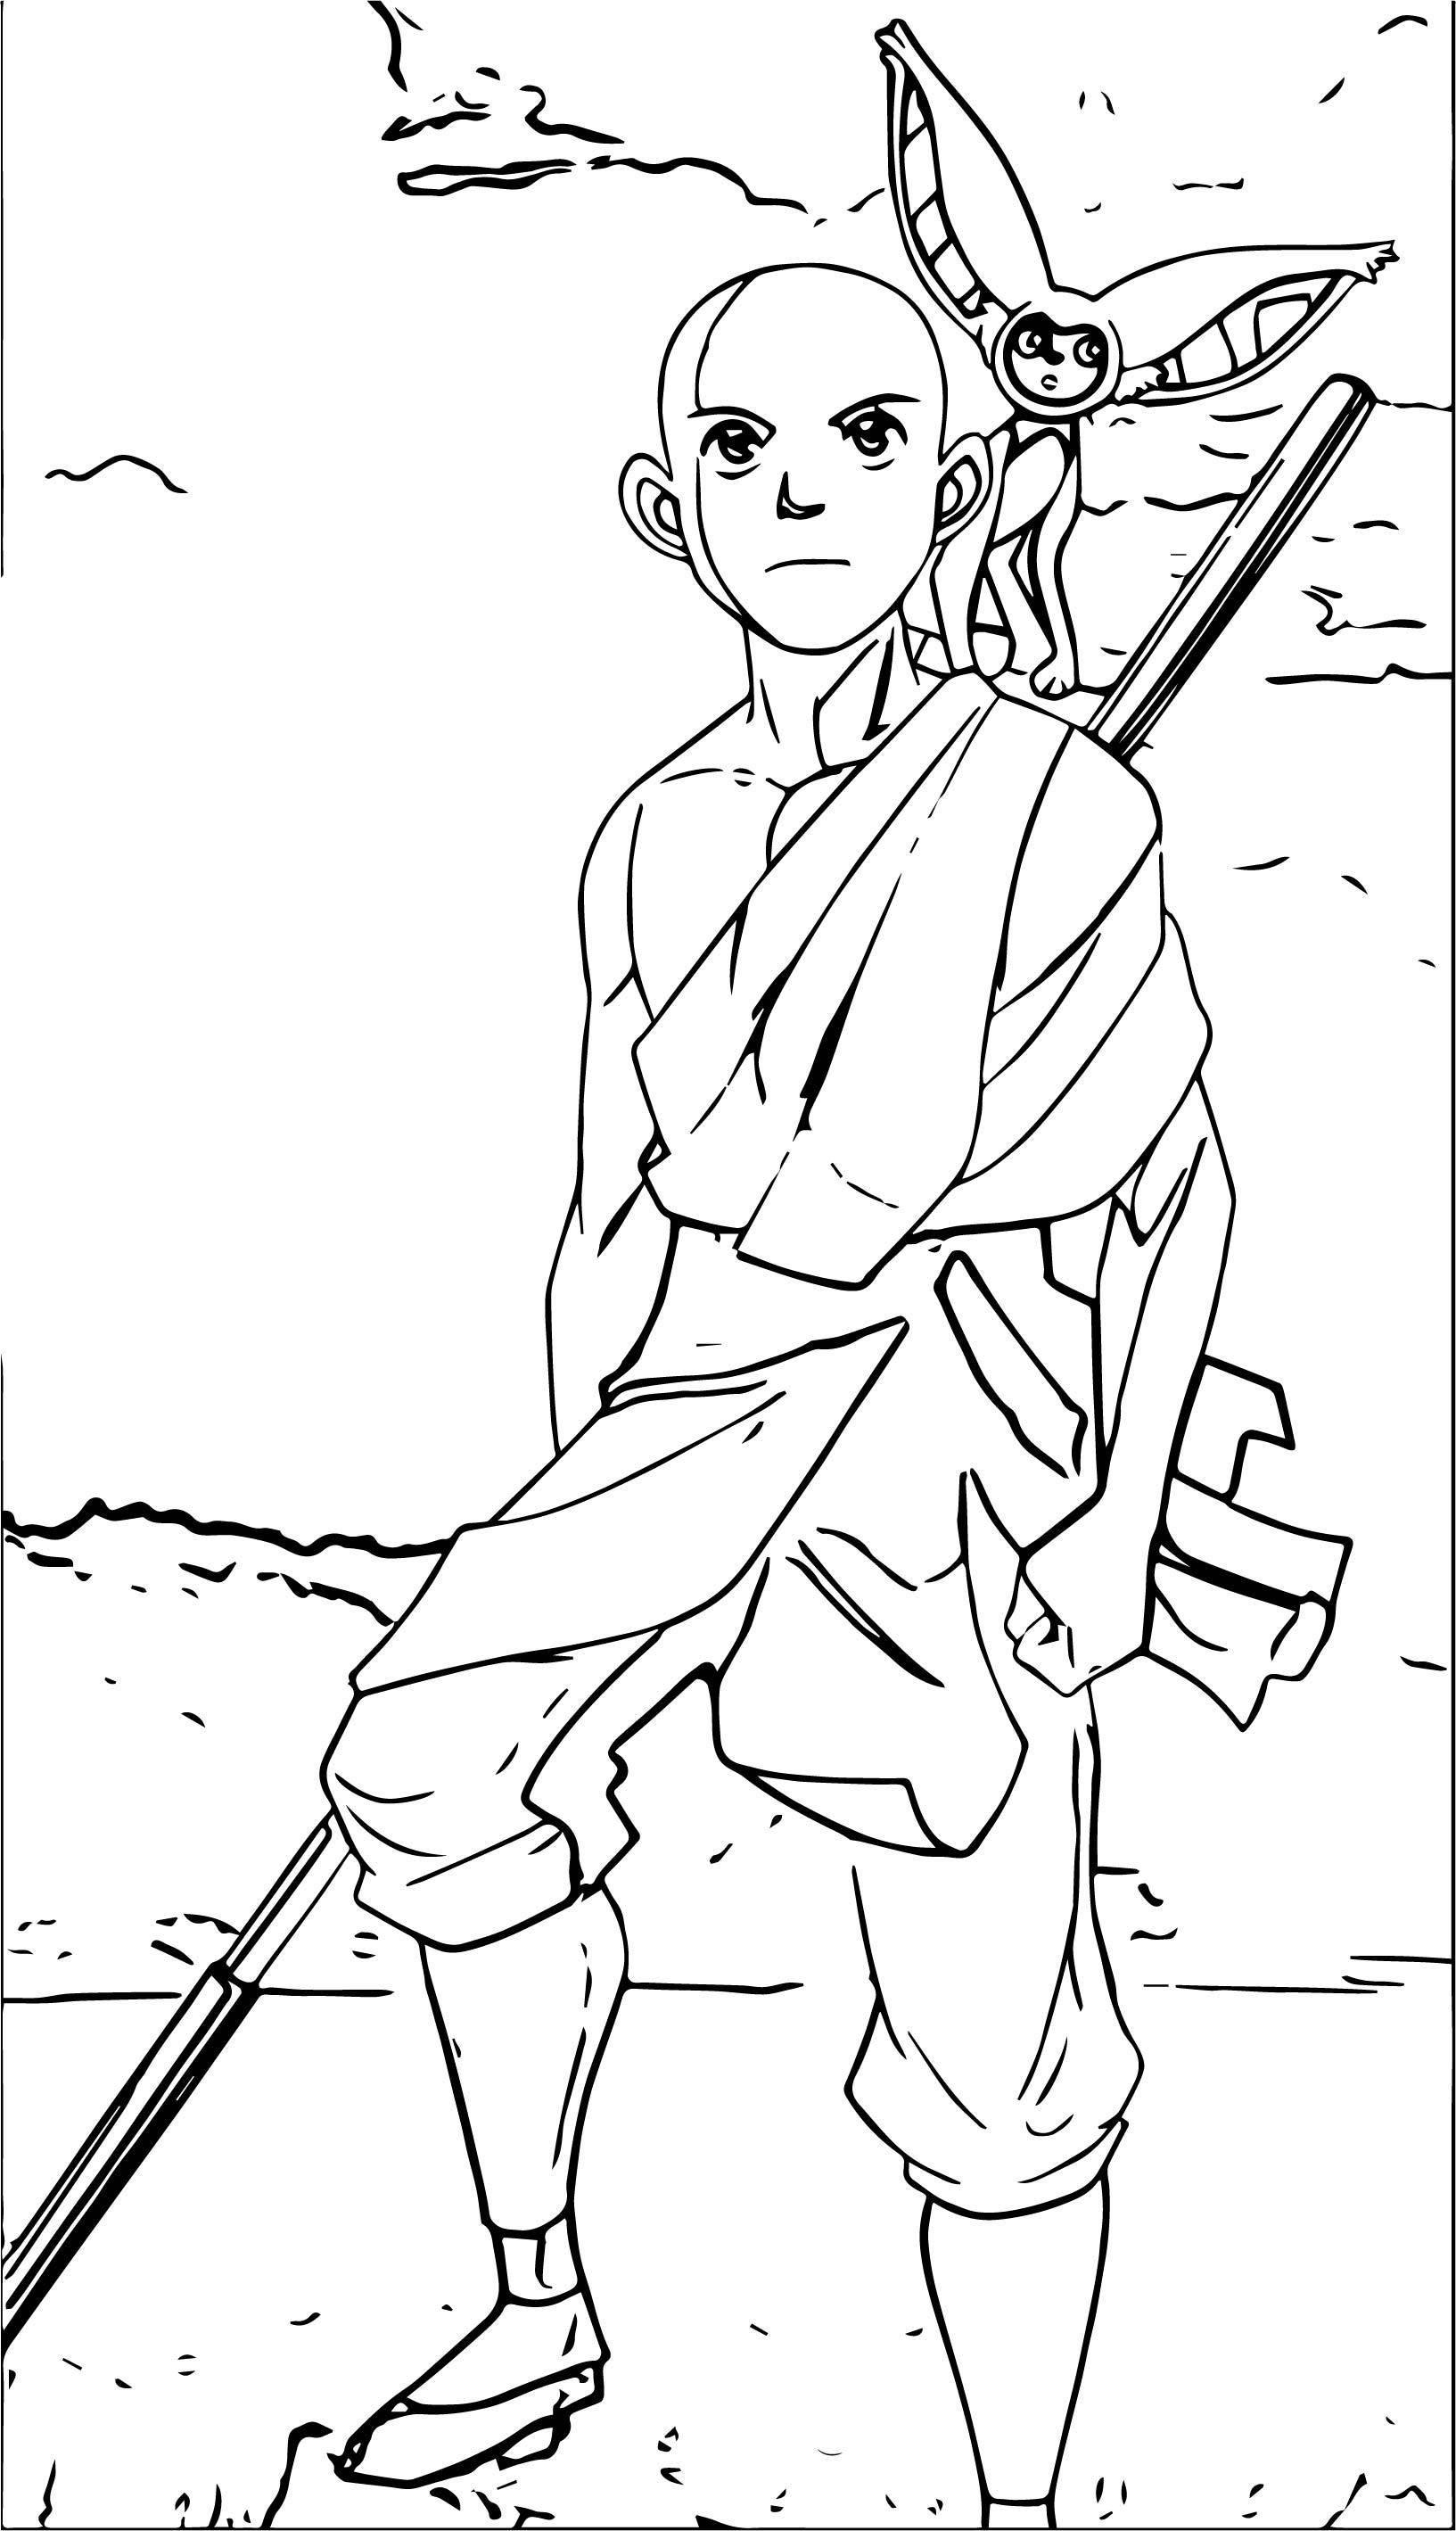 Aang Avatar Aang Coloring Page  2141452 2141452